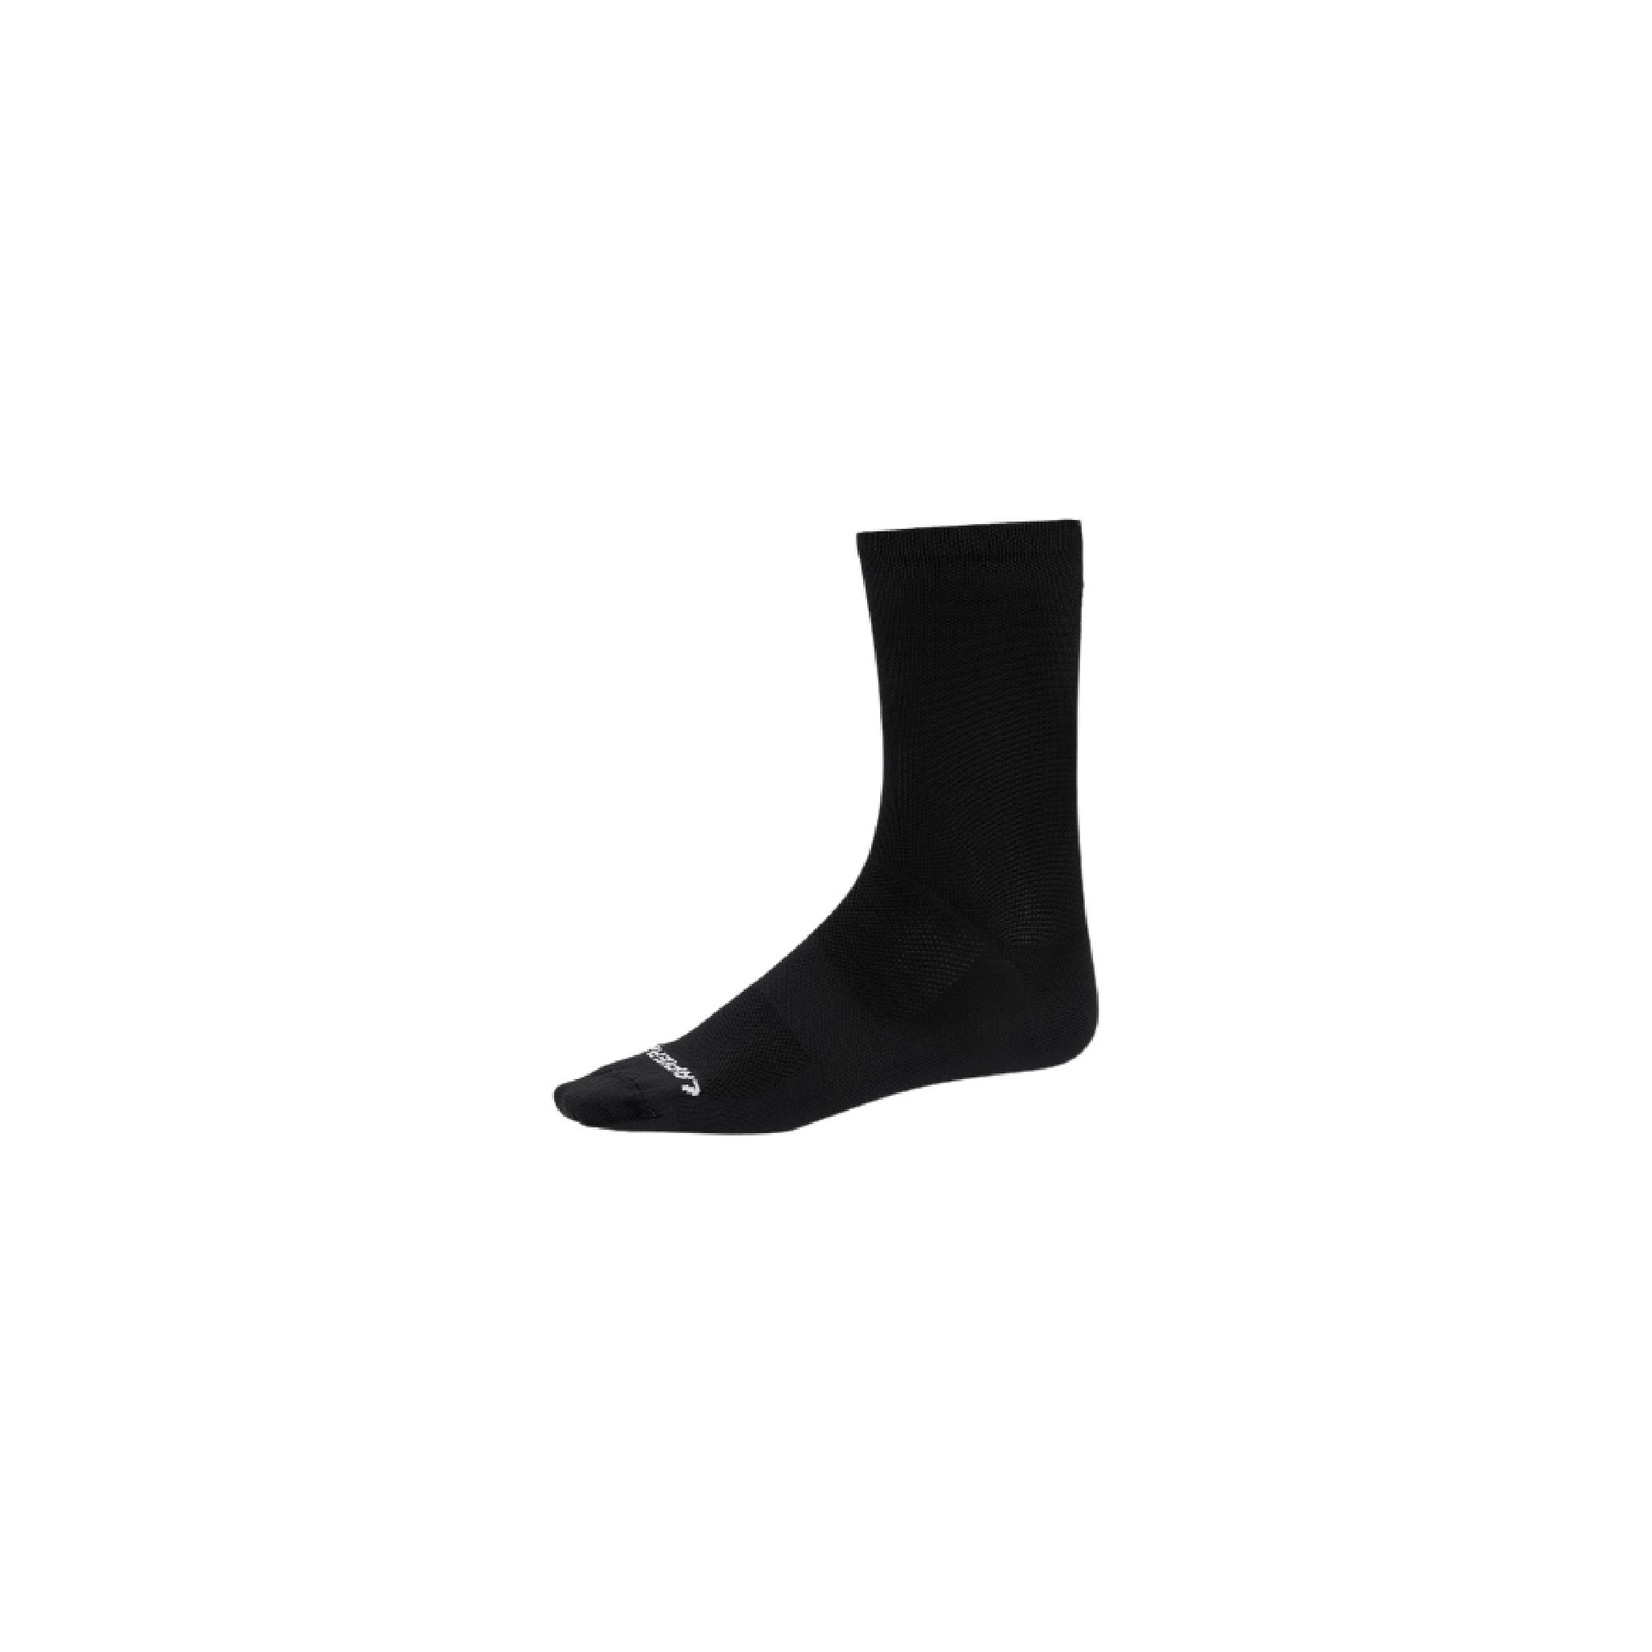 Lapierre Ultimate Cycling Socks Black 39/42